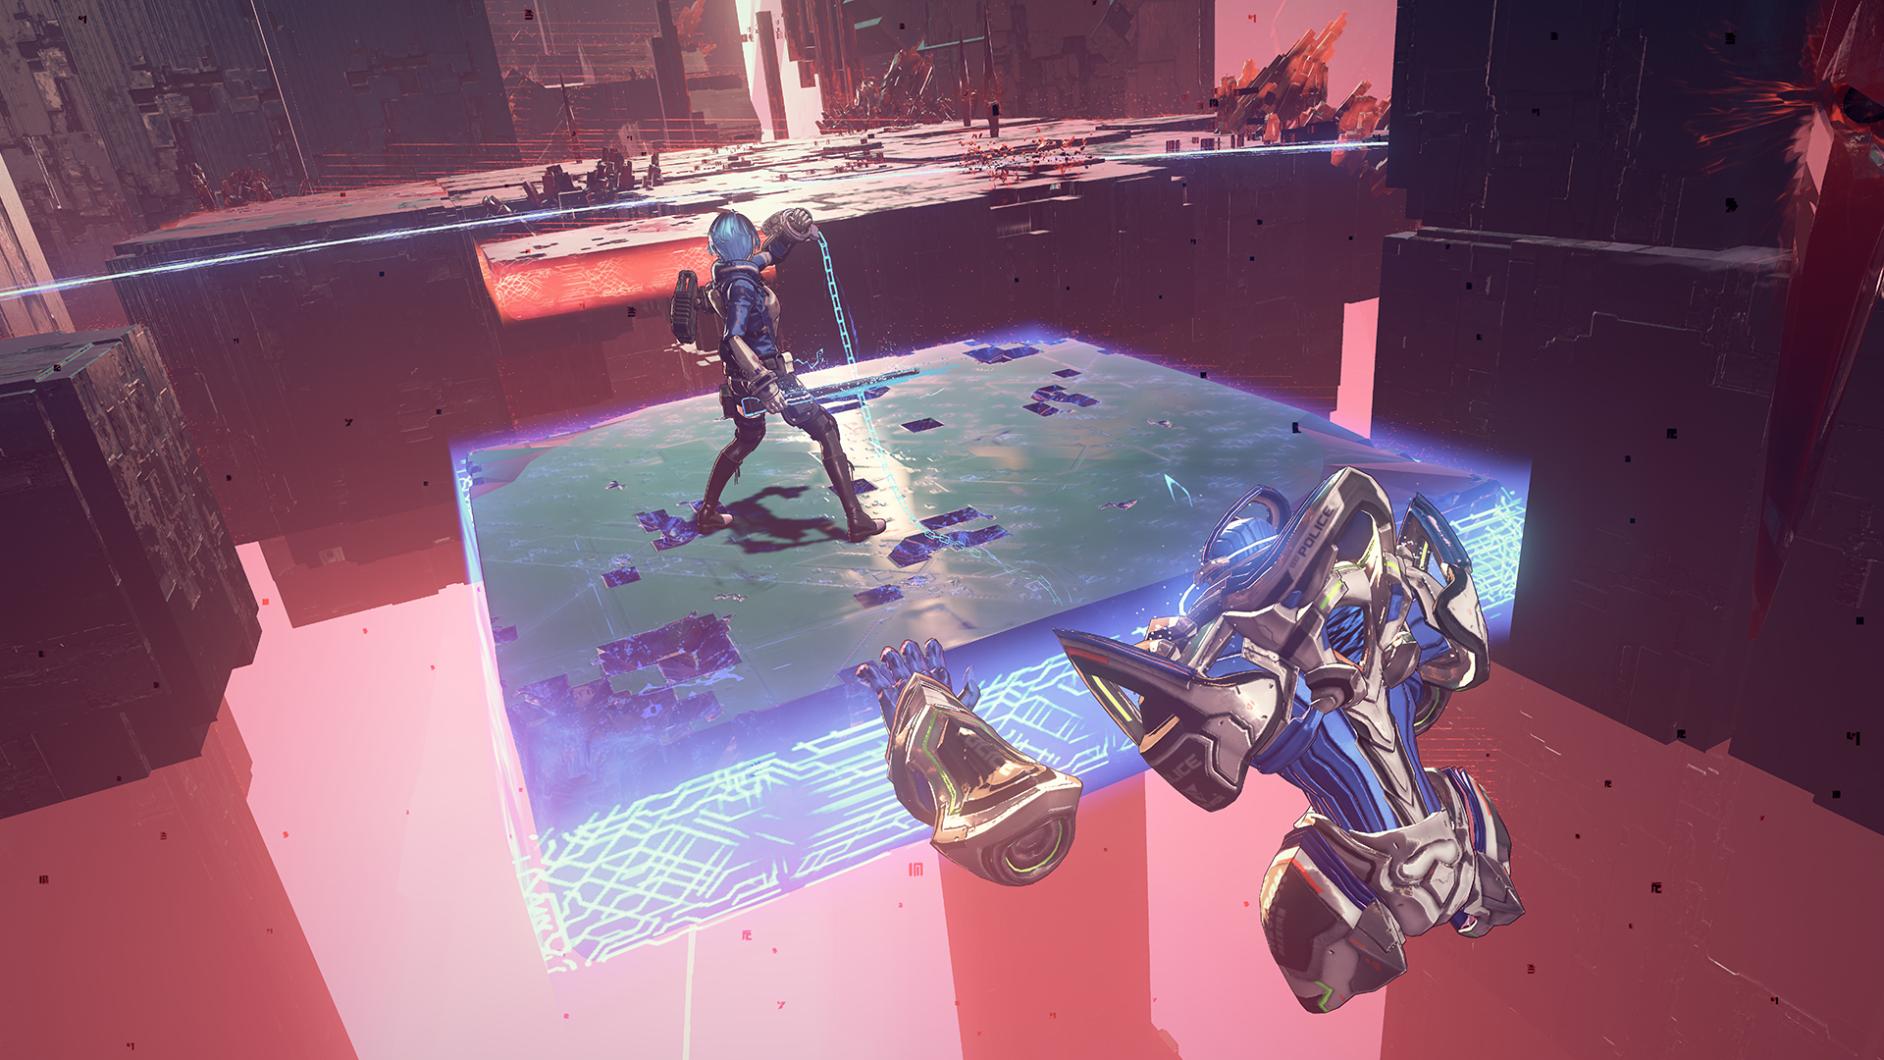 Astra Chain Legion pushing platform